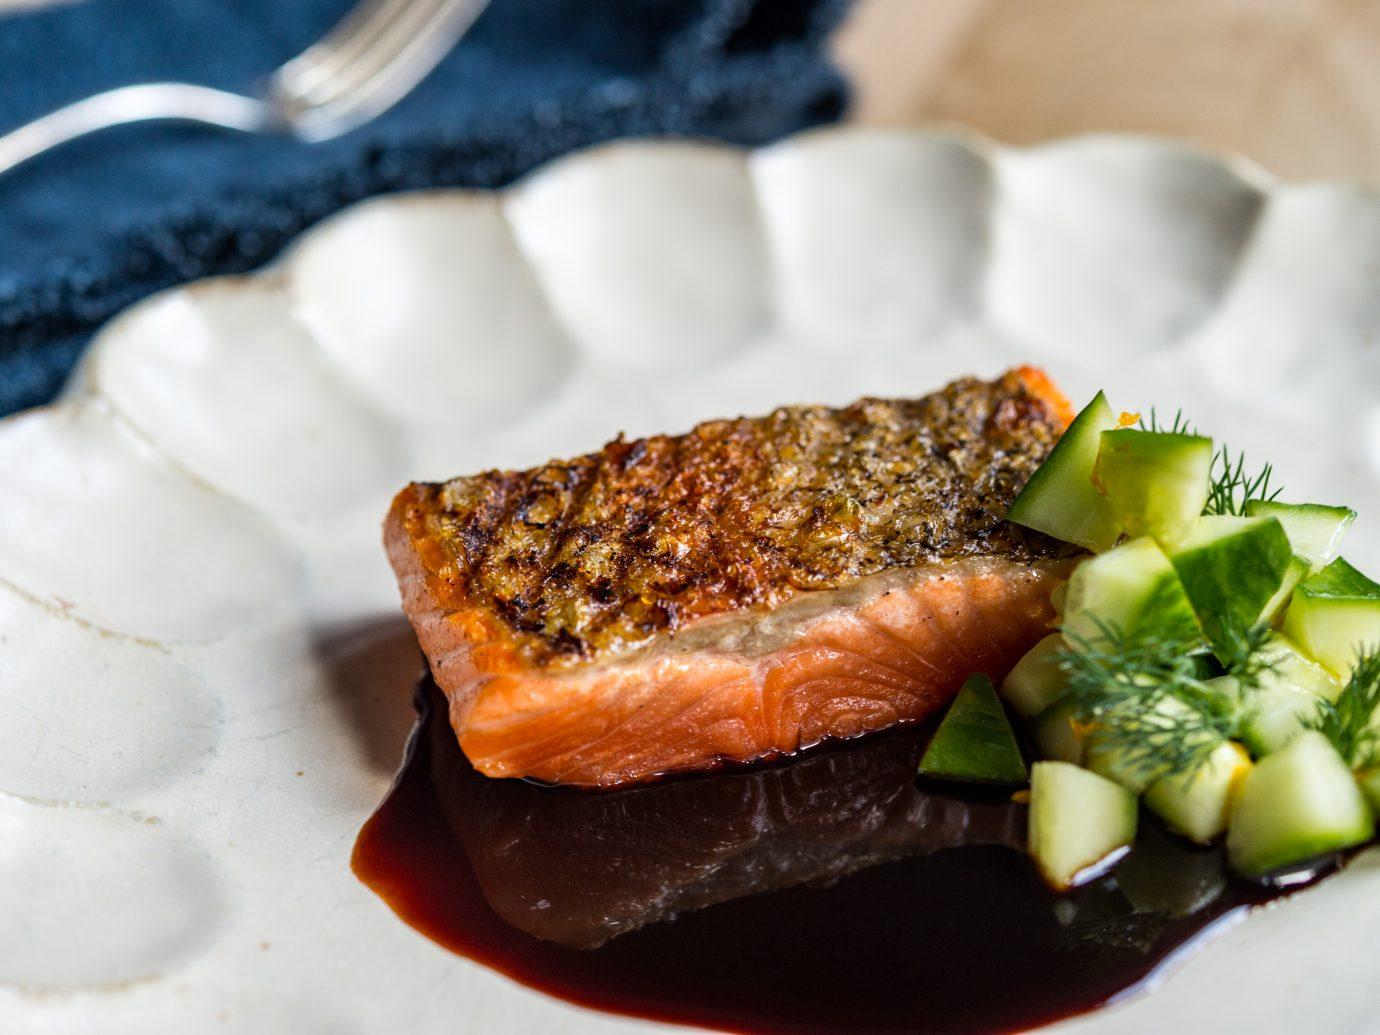 Salmon In Sauce Meurette at La Mercerie